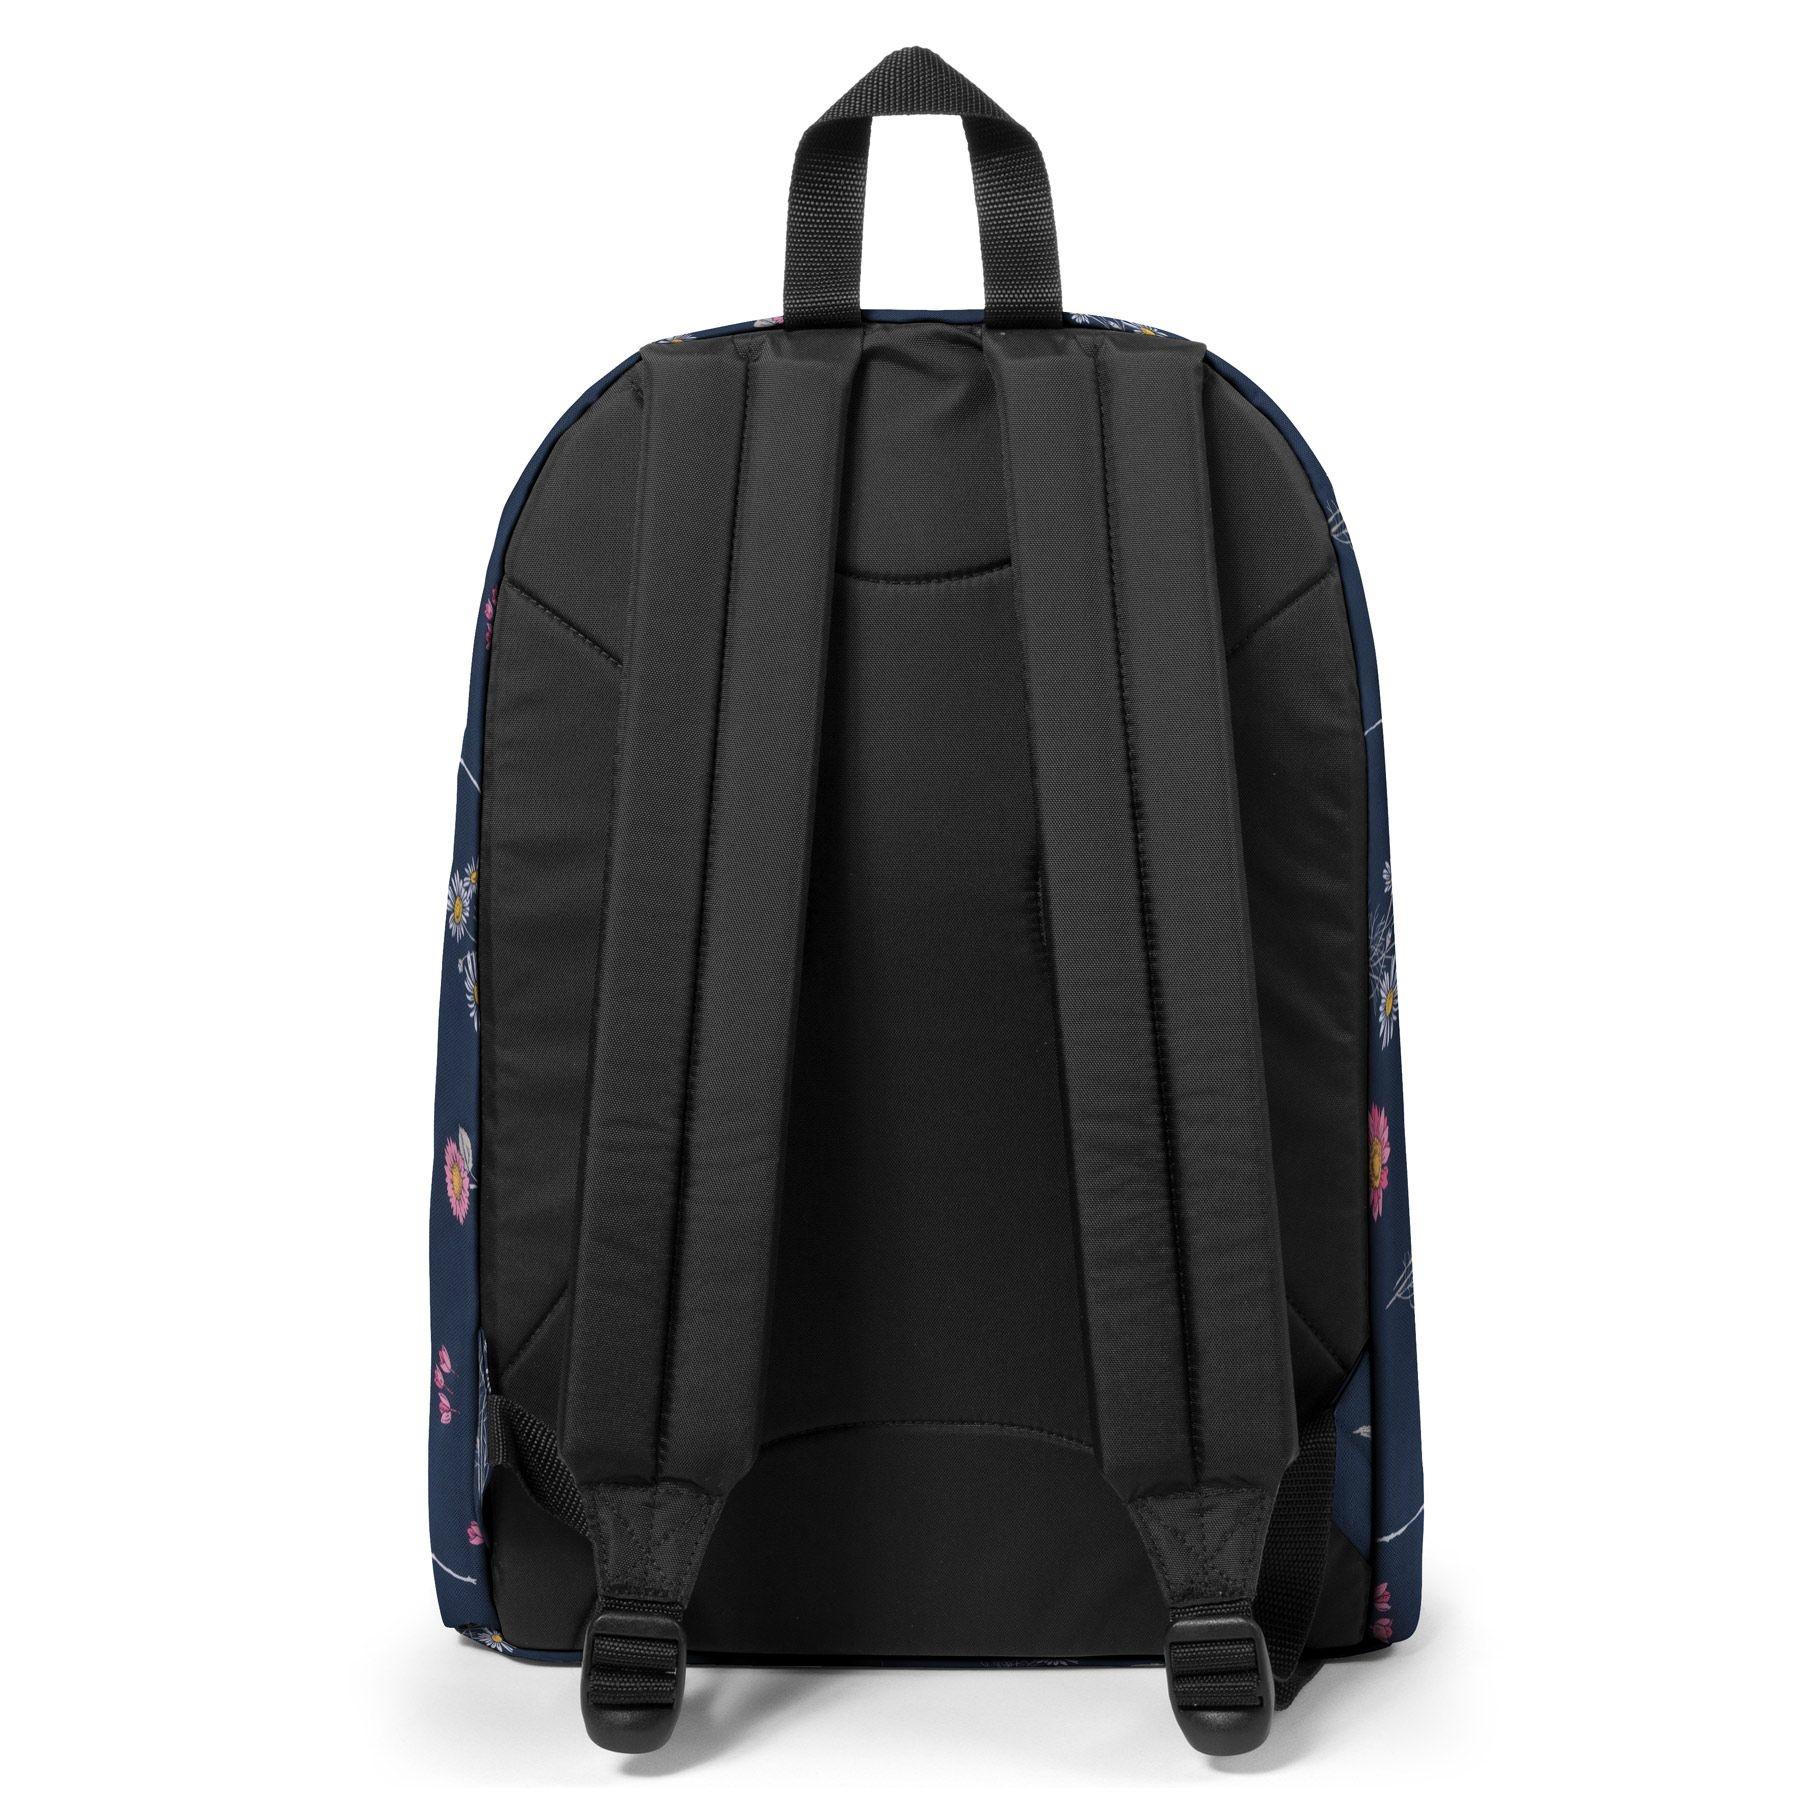 Eastpak Eastpak Out Of Office Wild Navy 15 inch laptop rugtas